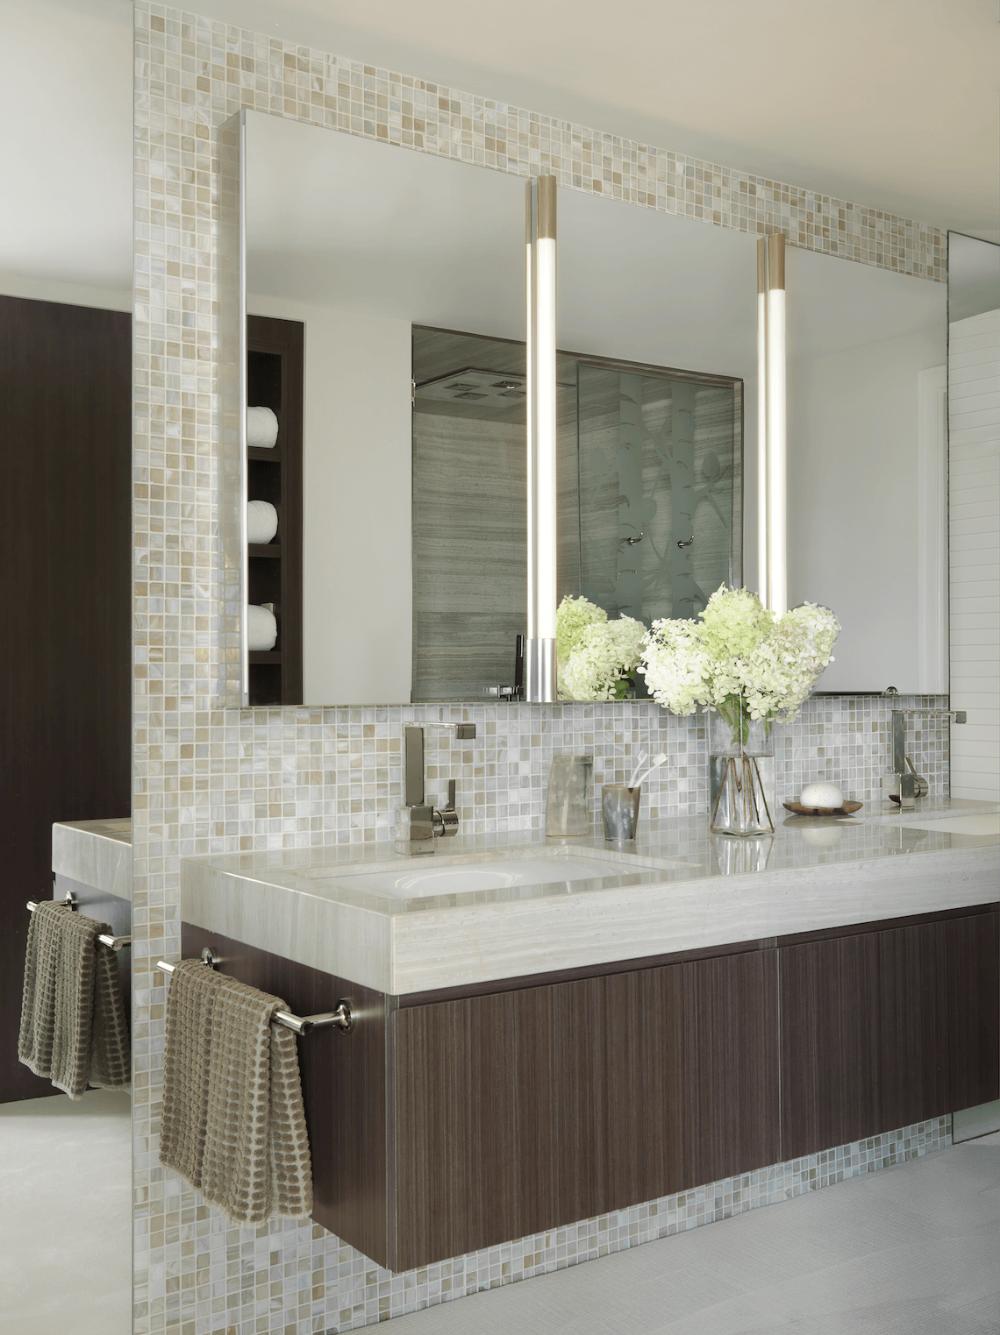 50 bathroom vanity ideas ingeniously prettify you and